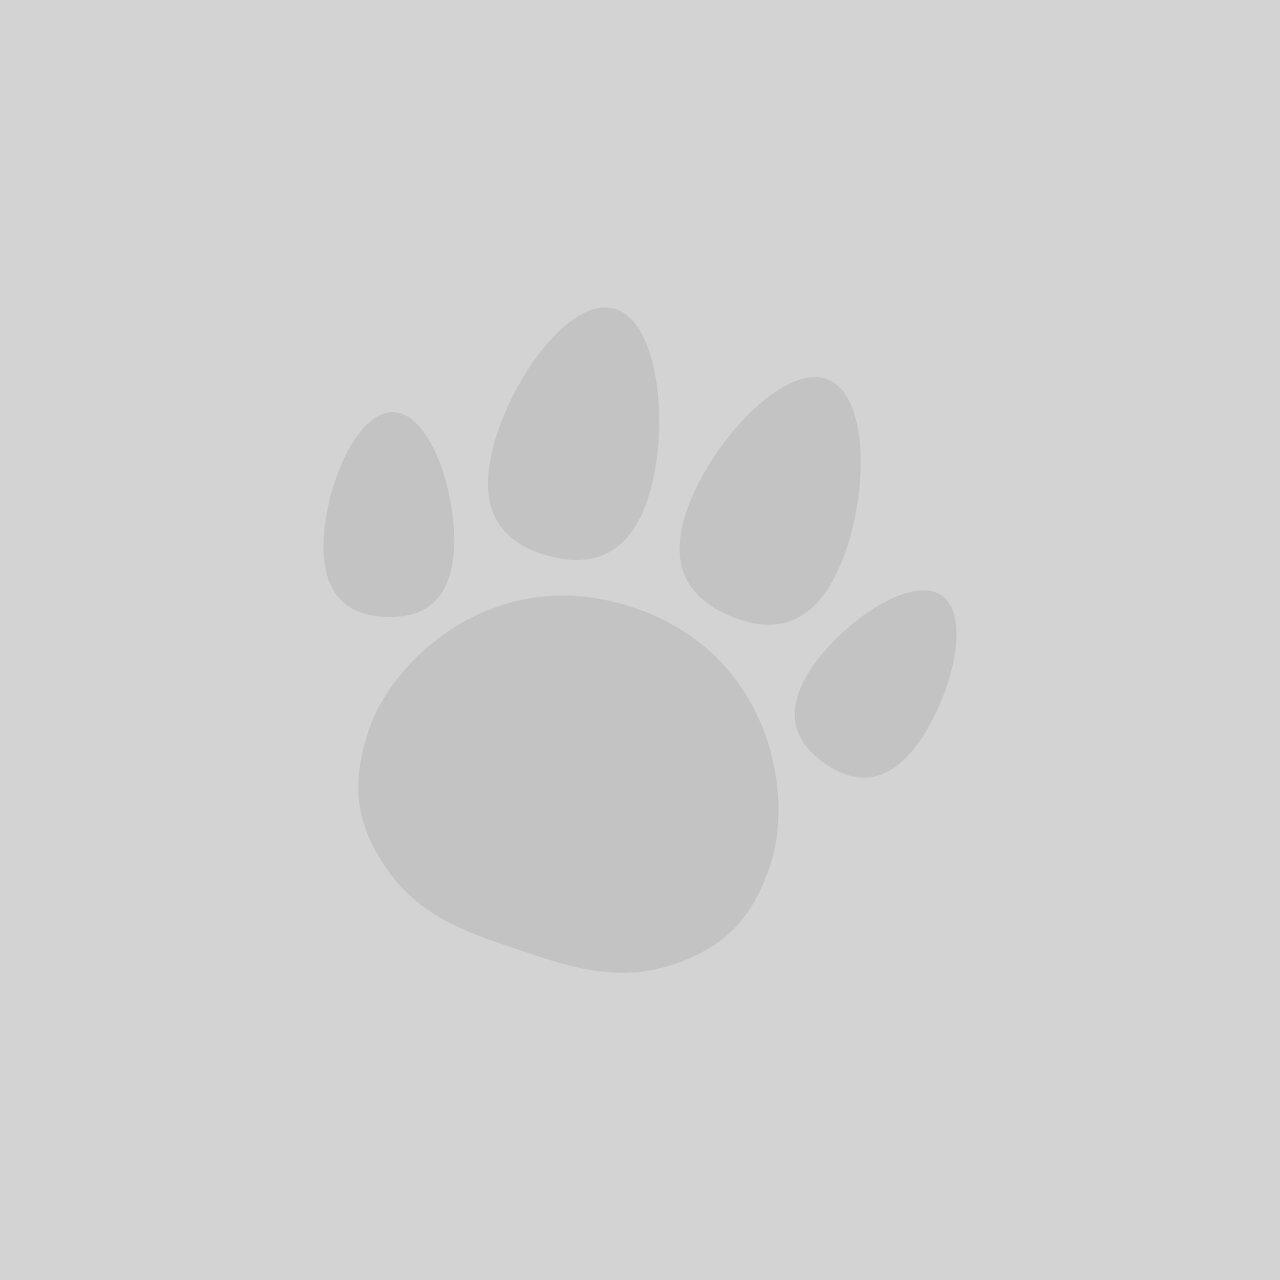 Holings Puffed Jerky Dog Chews 100g